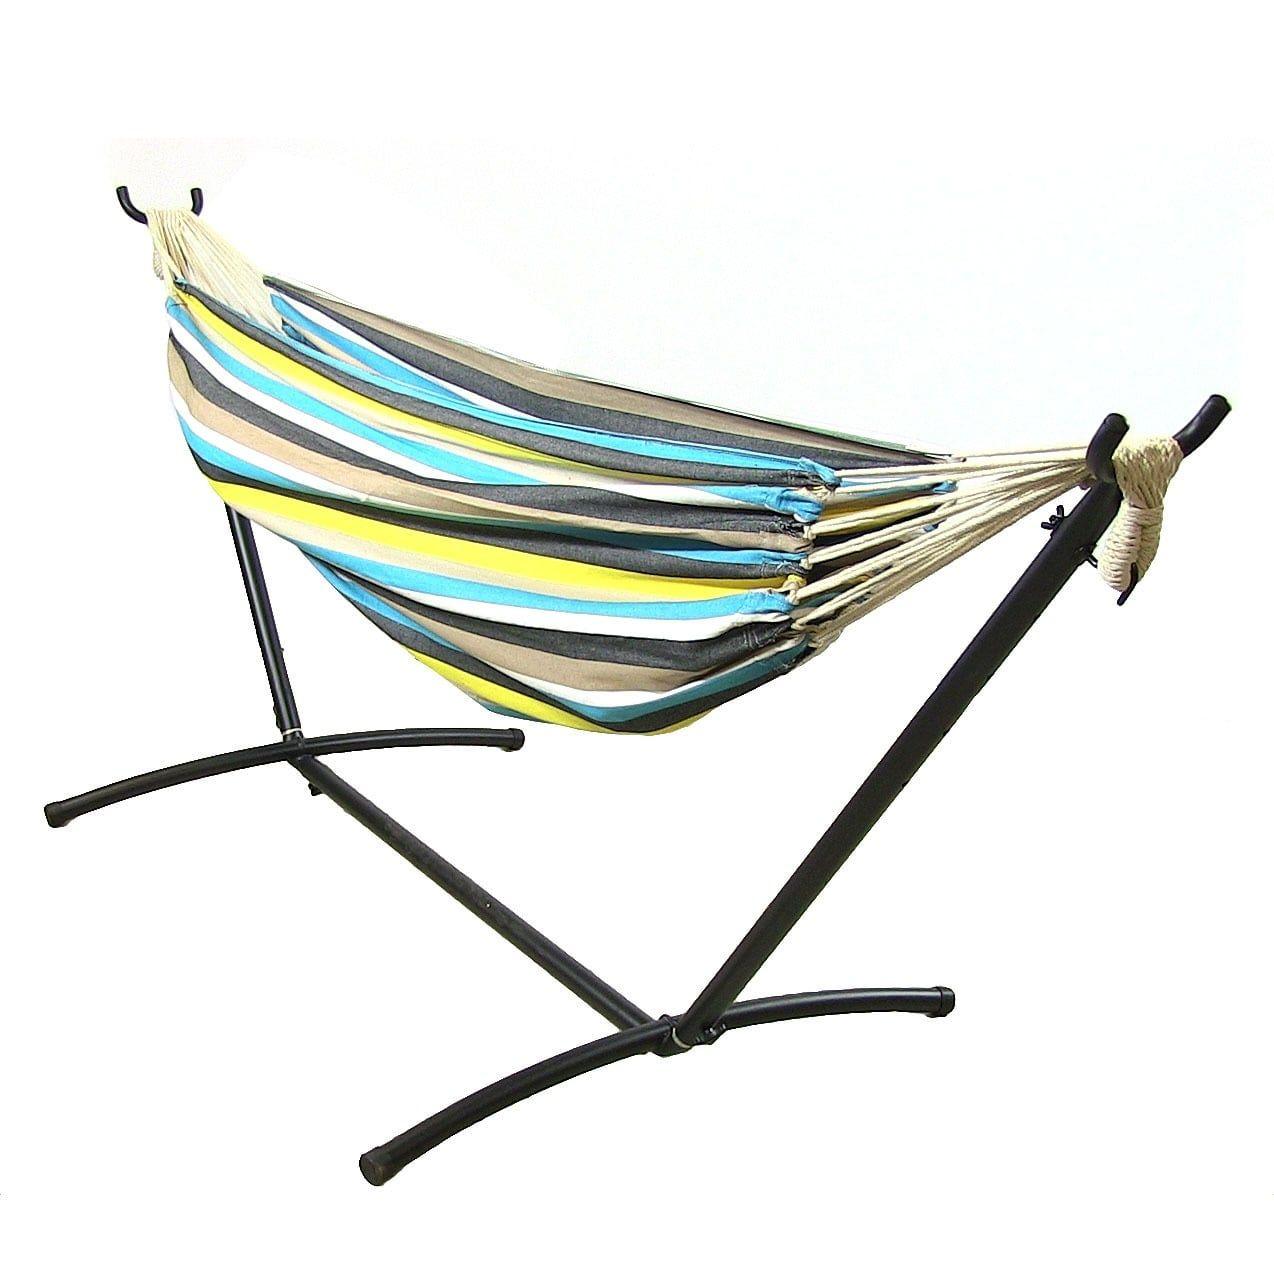 sunnydaze premium 100   natural tightly woven cotton double brazilian hammock  u0026 hammock stand  ocean sunnydaze premium 100   natural tightly woven cotton double      rh   pinterest